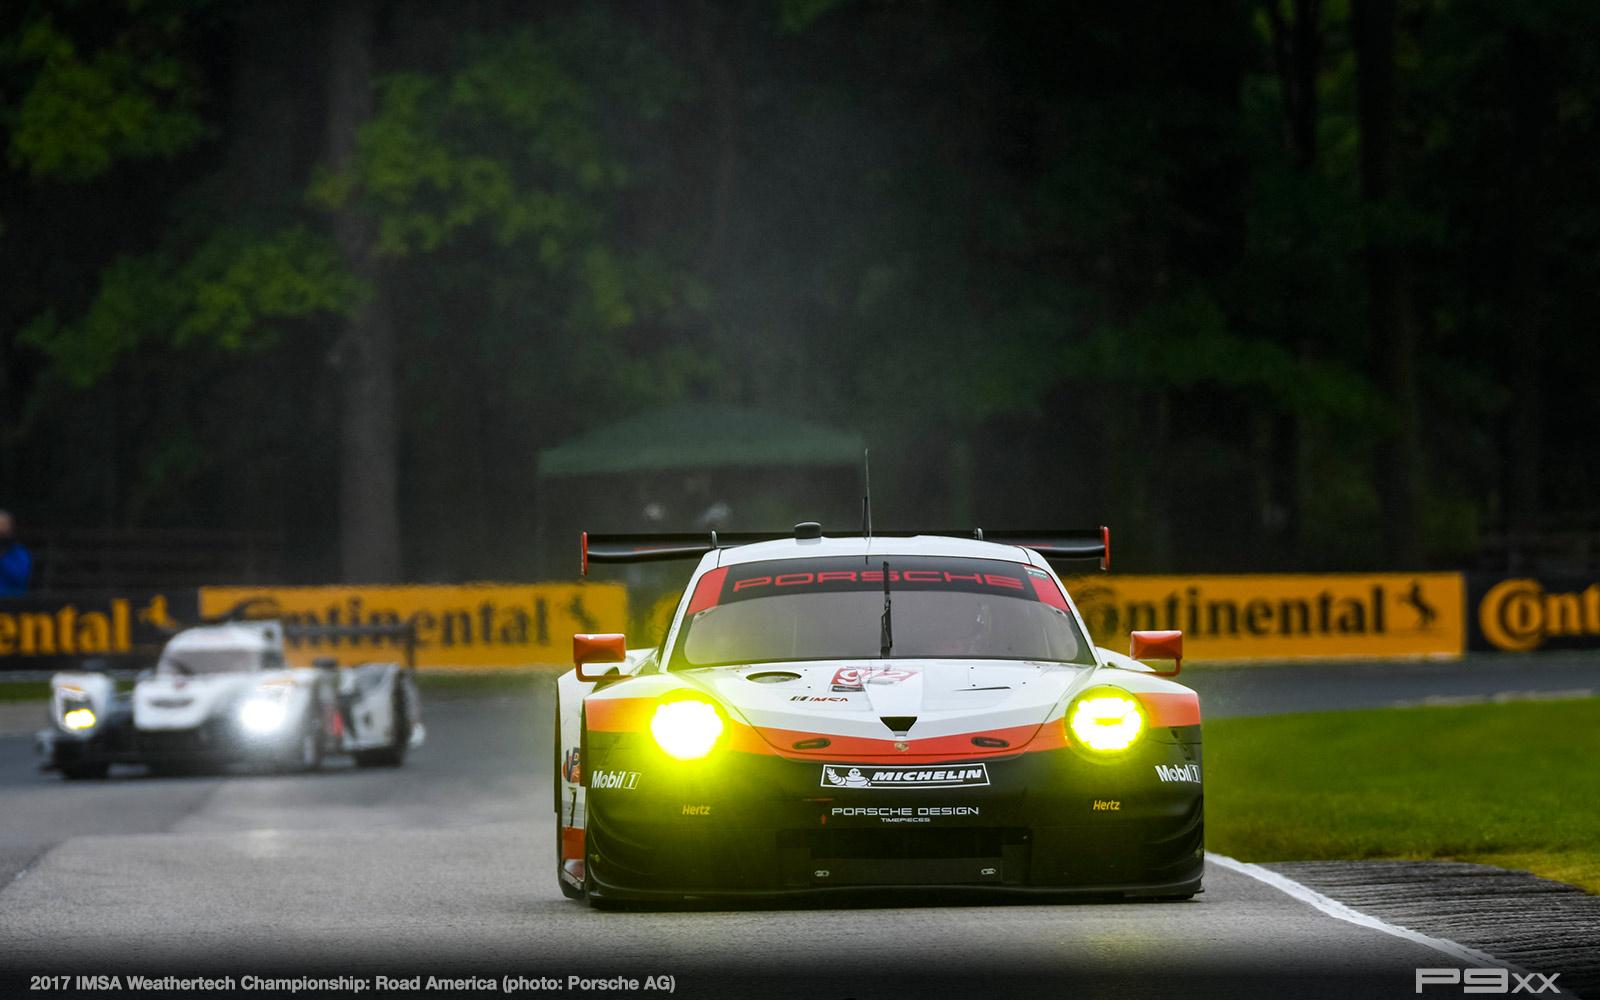 2017-IMSA-Weathertech-Road-America-Porsche-289